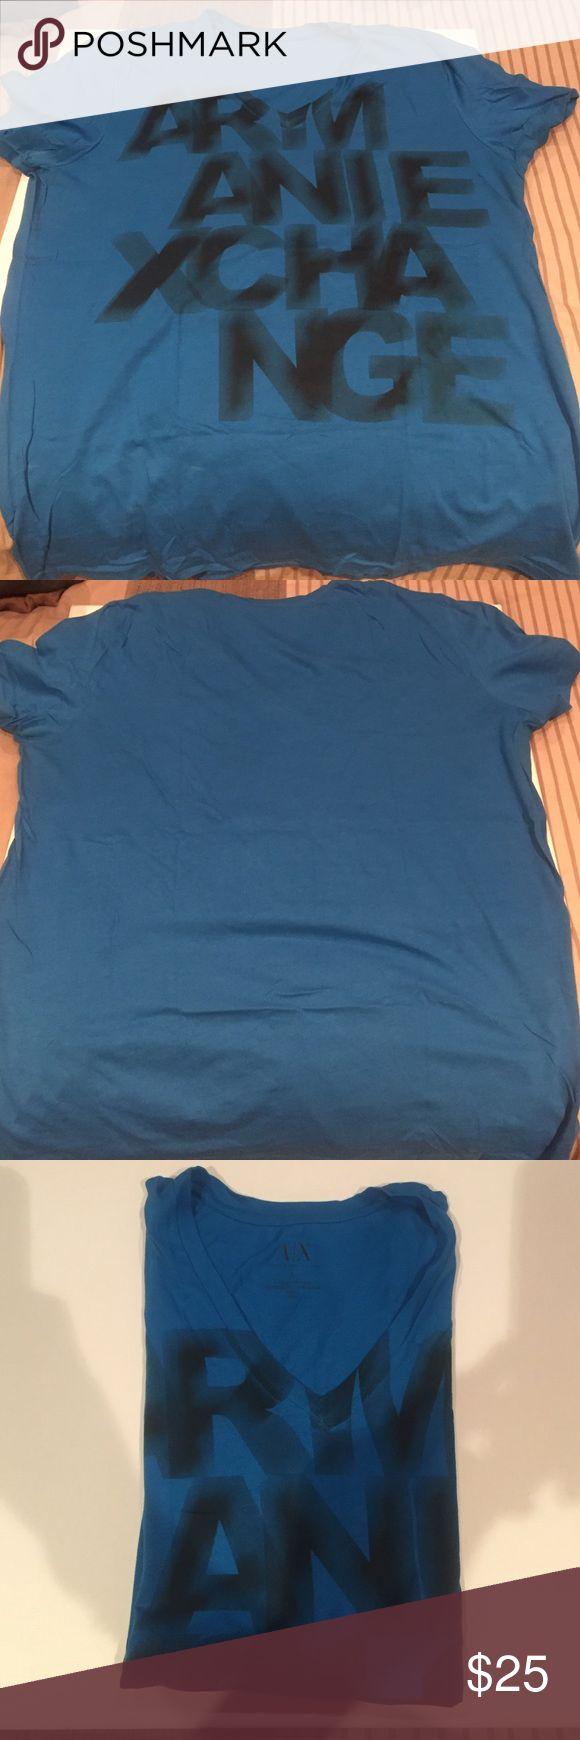 Graffic tee A/X fashionable tee A/X Armani Exchange Shirts Tees - Short Sleeve